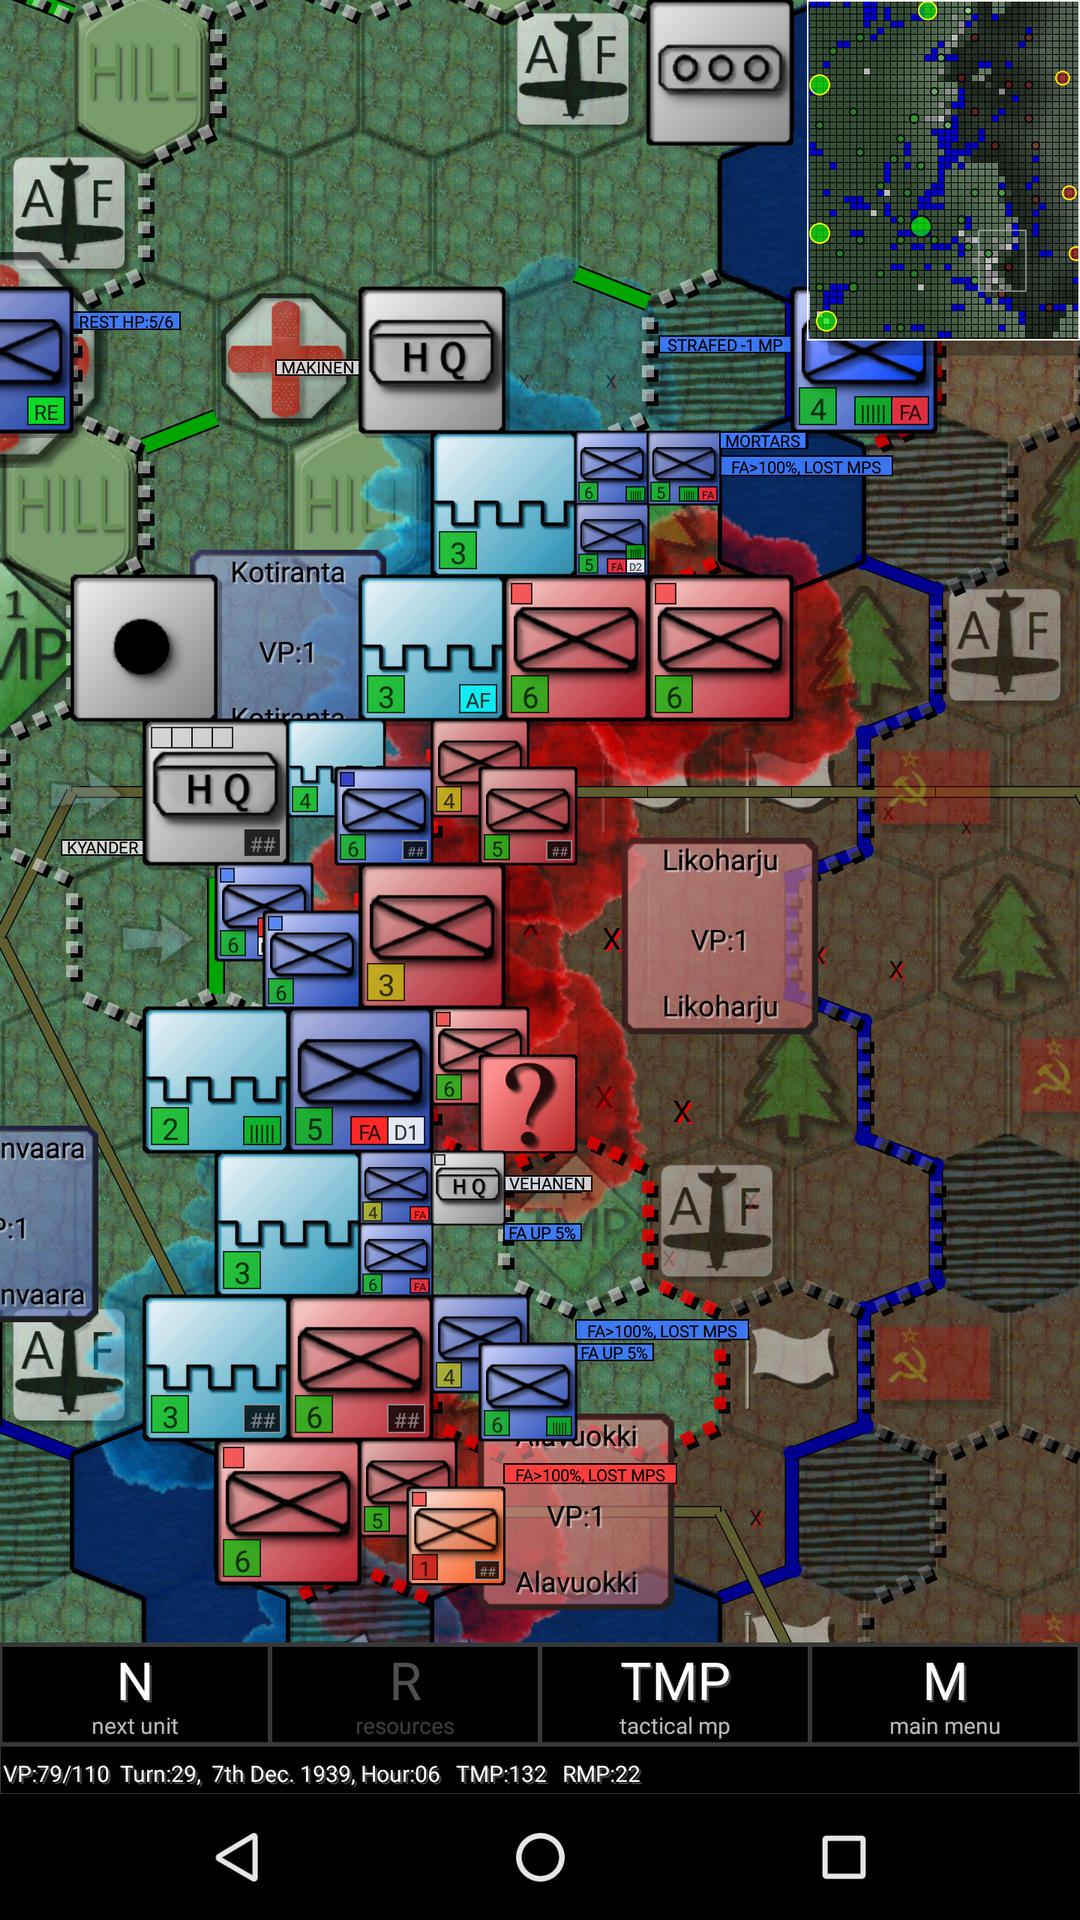 Battle of Suomussalmi Battle, Suomussalmi Battle